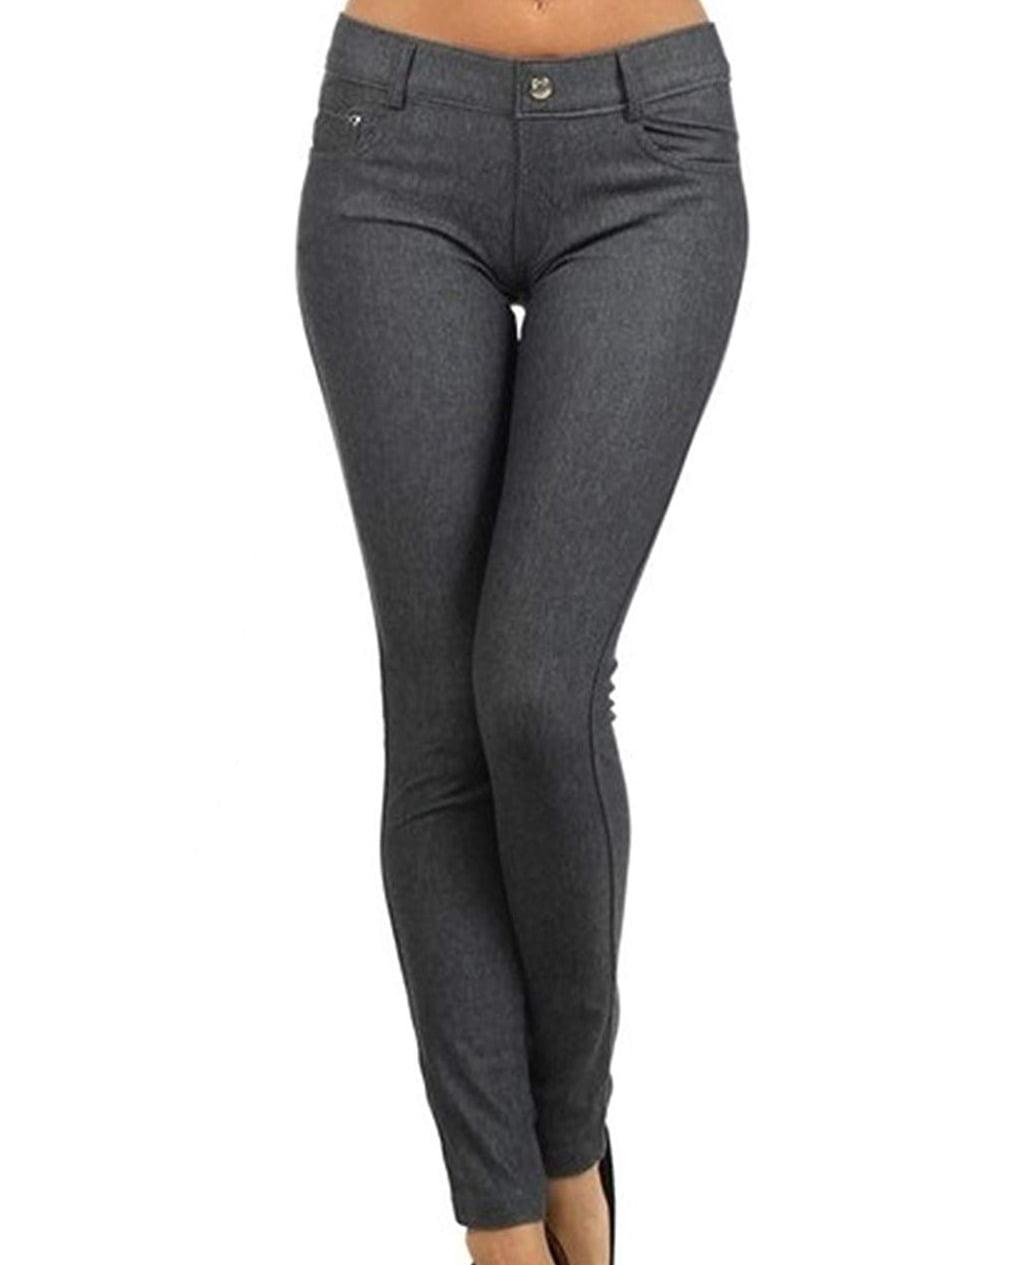 Deep Gray Women's Plus Mid-Rise Jeggings Leggings $44 3X